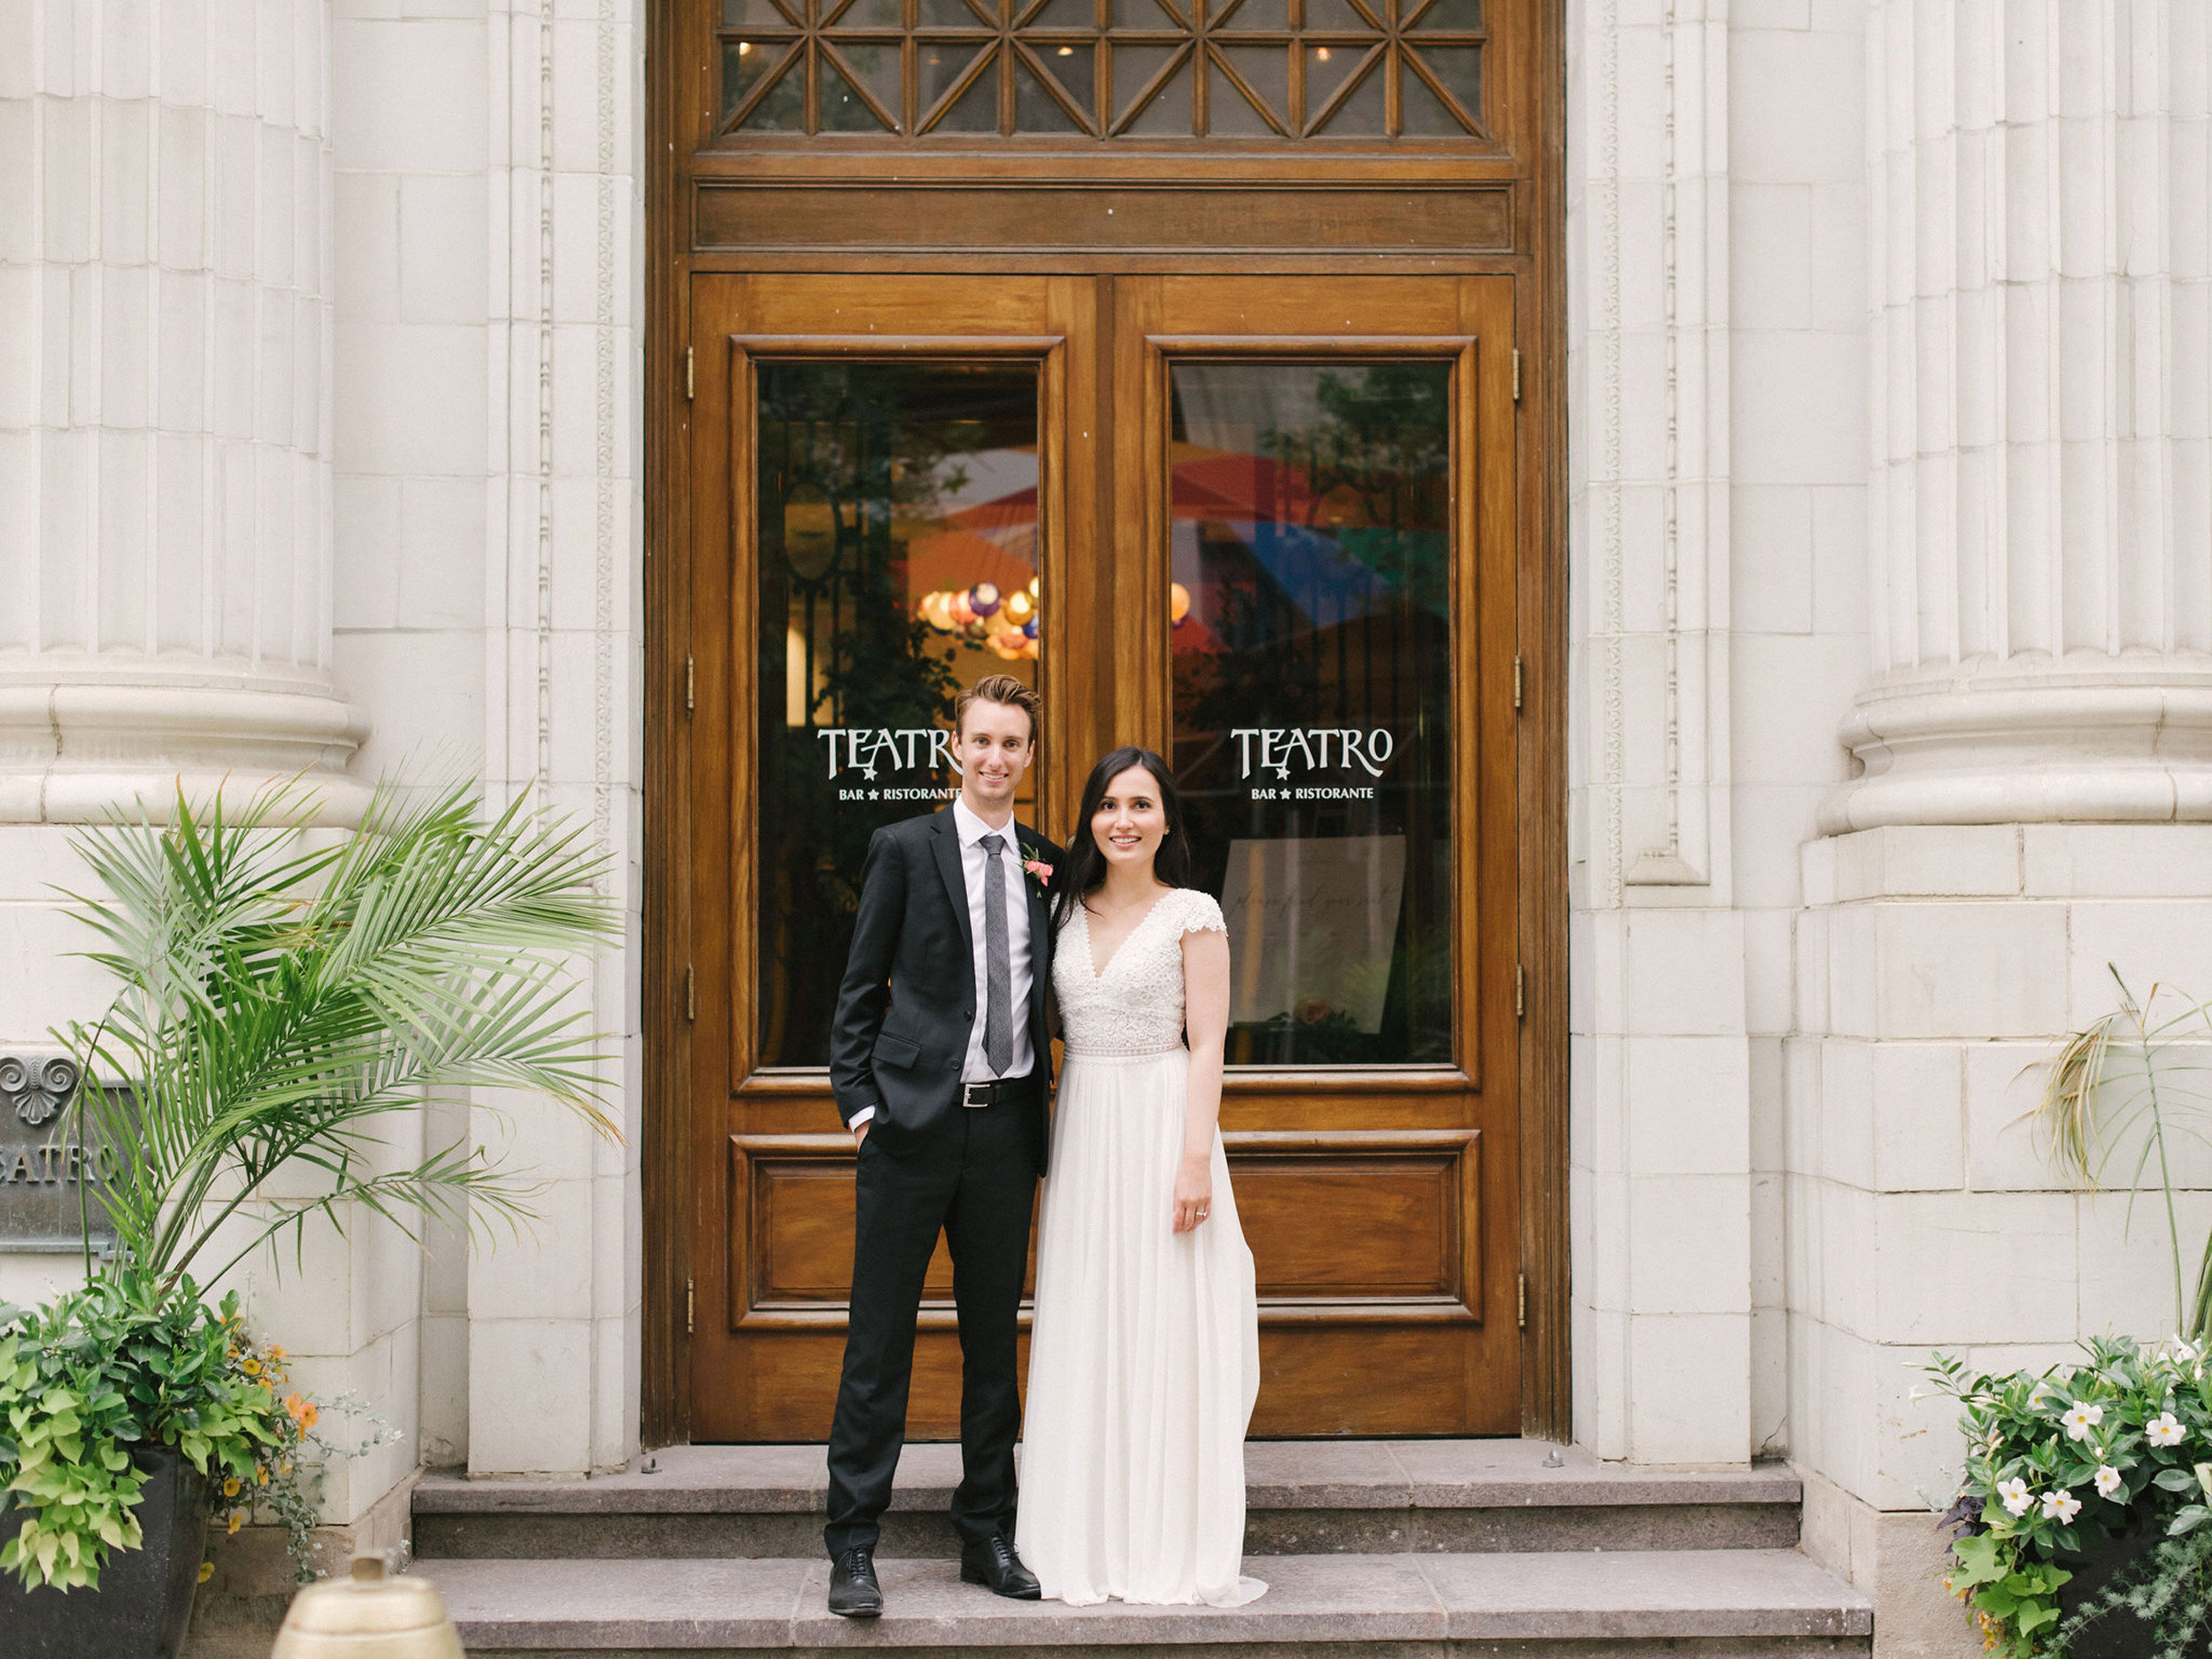 032-Teatro_Wedding_Calgary.jpg